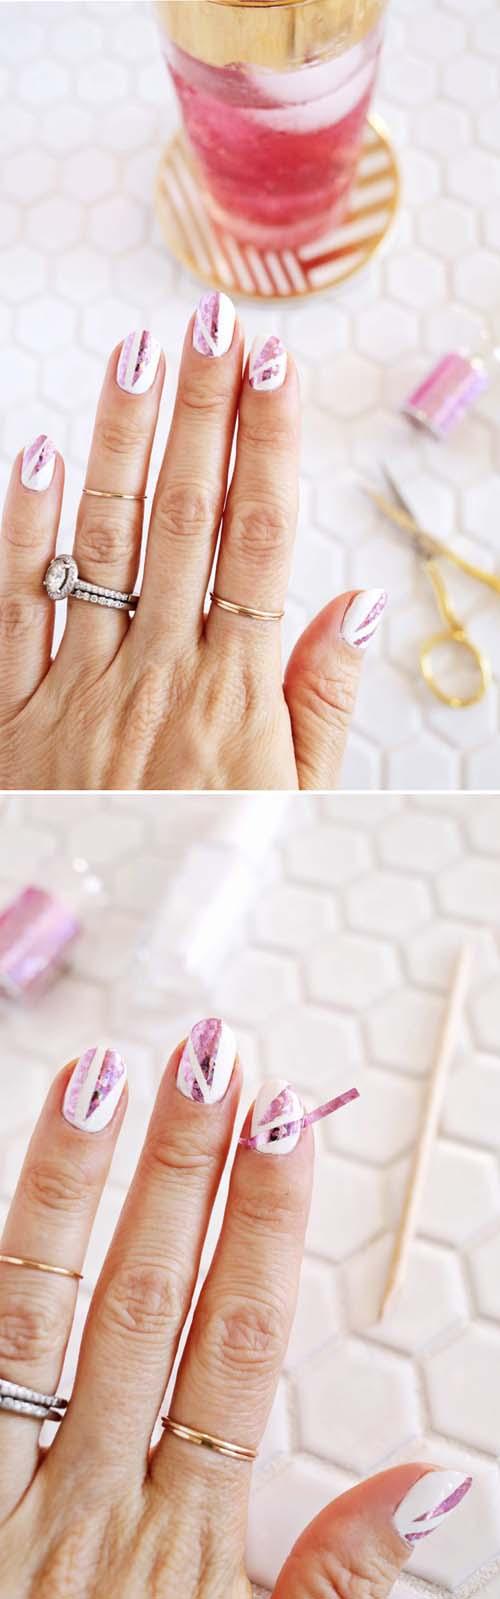 Nail art: 15 πανεύκολα σχέδια στα νύχια ακόμη και για αρχάριες (2)